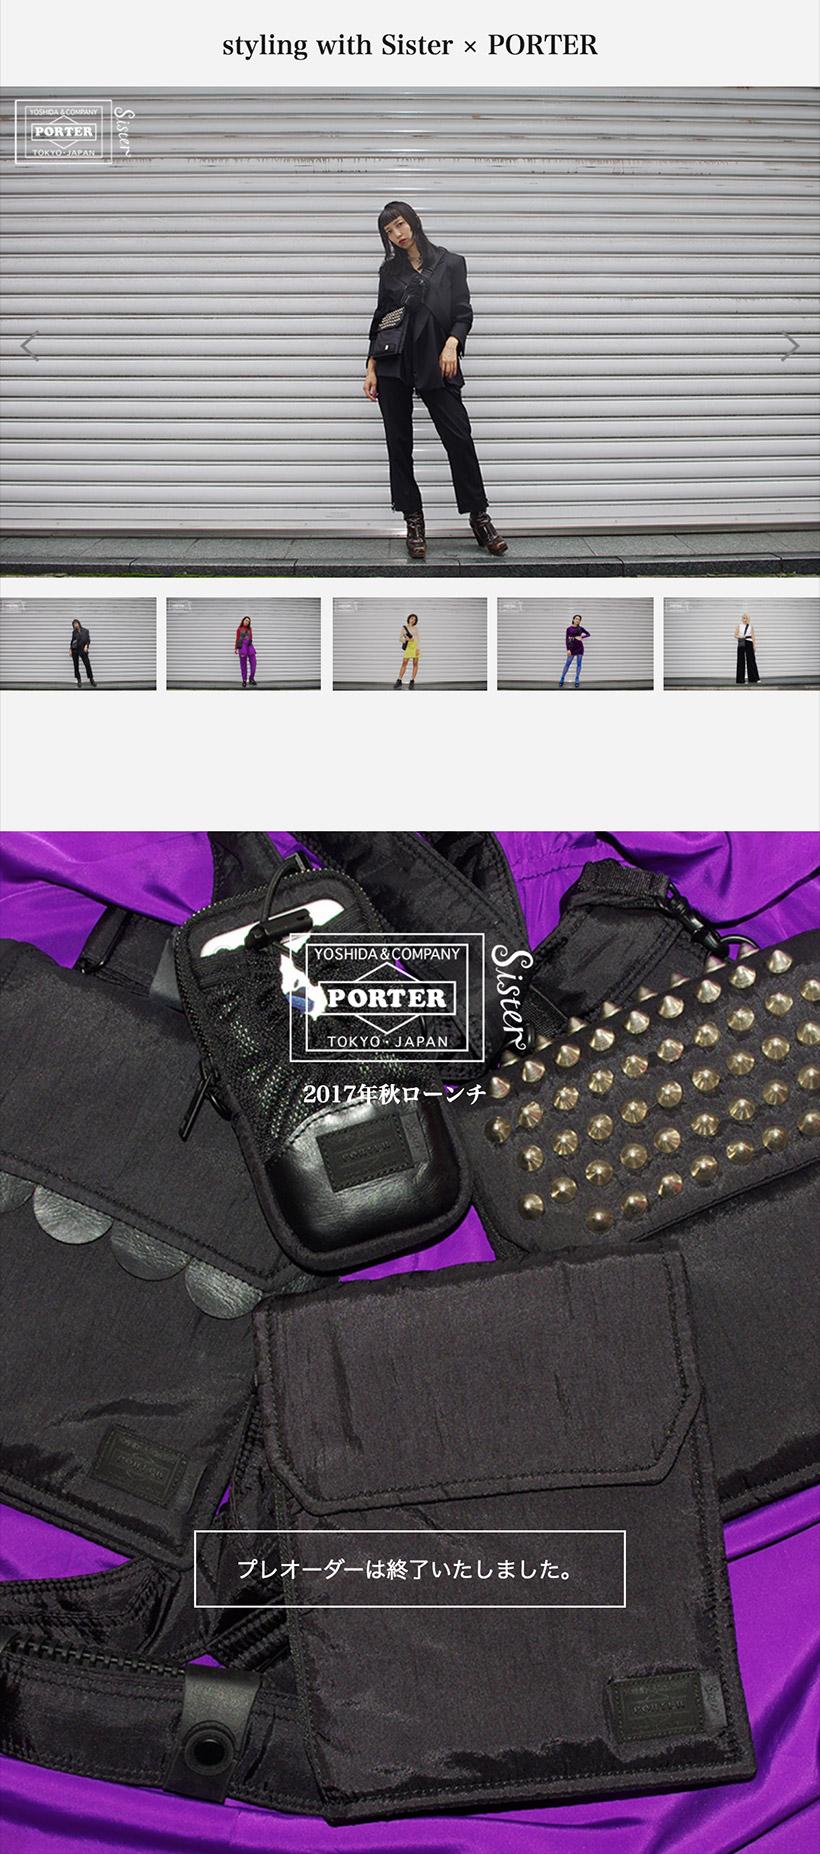 Sister x PORTER 2nd